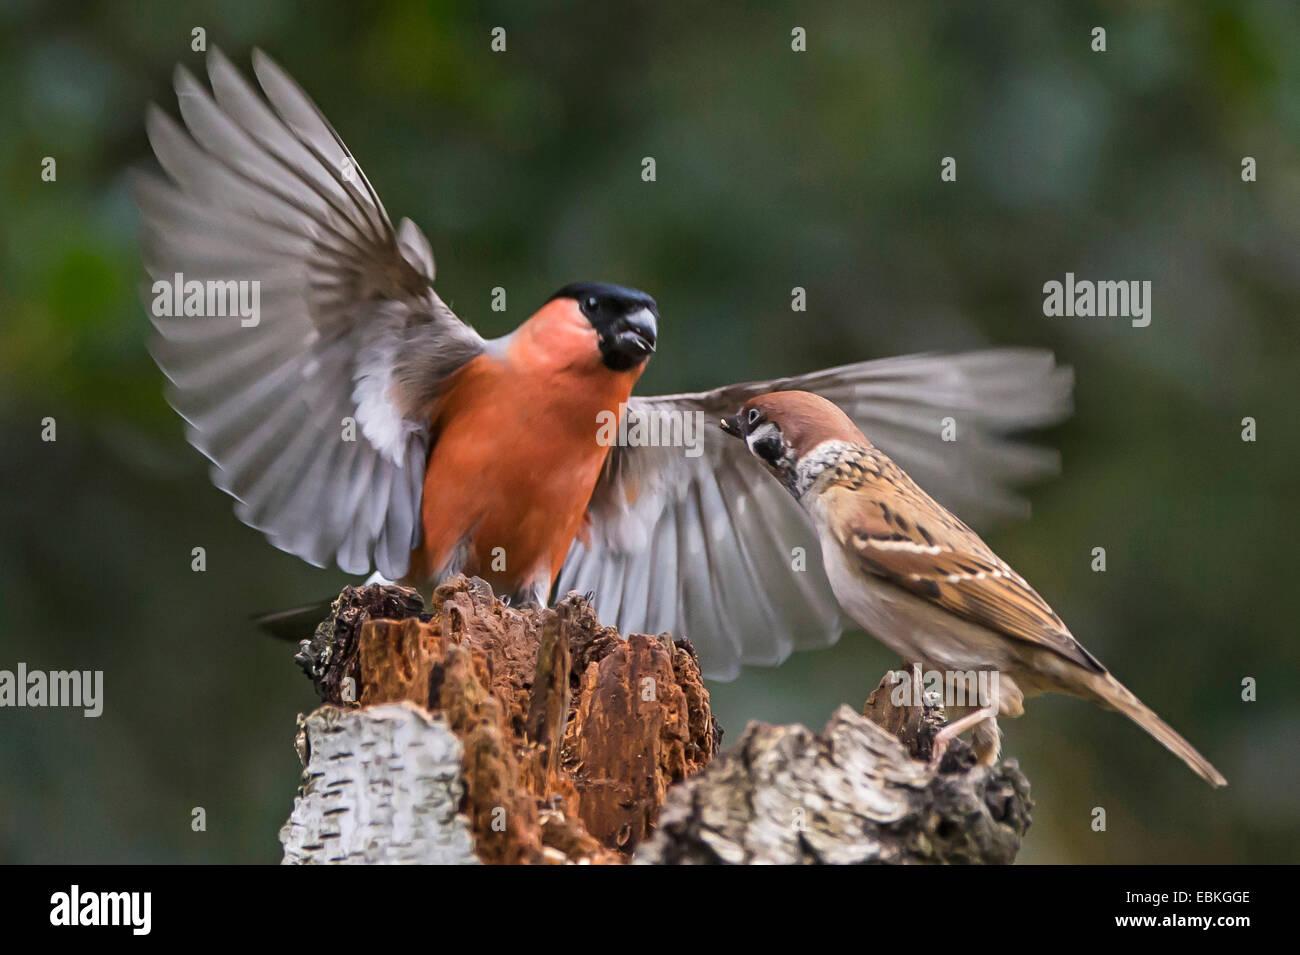 bullfinch, Eurasian bullfinch, northern bullfinch (Pyrrhula pyrrhula), fighting with field sparrow, Germany, North - Stock Image